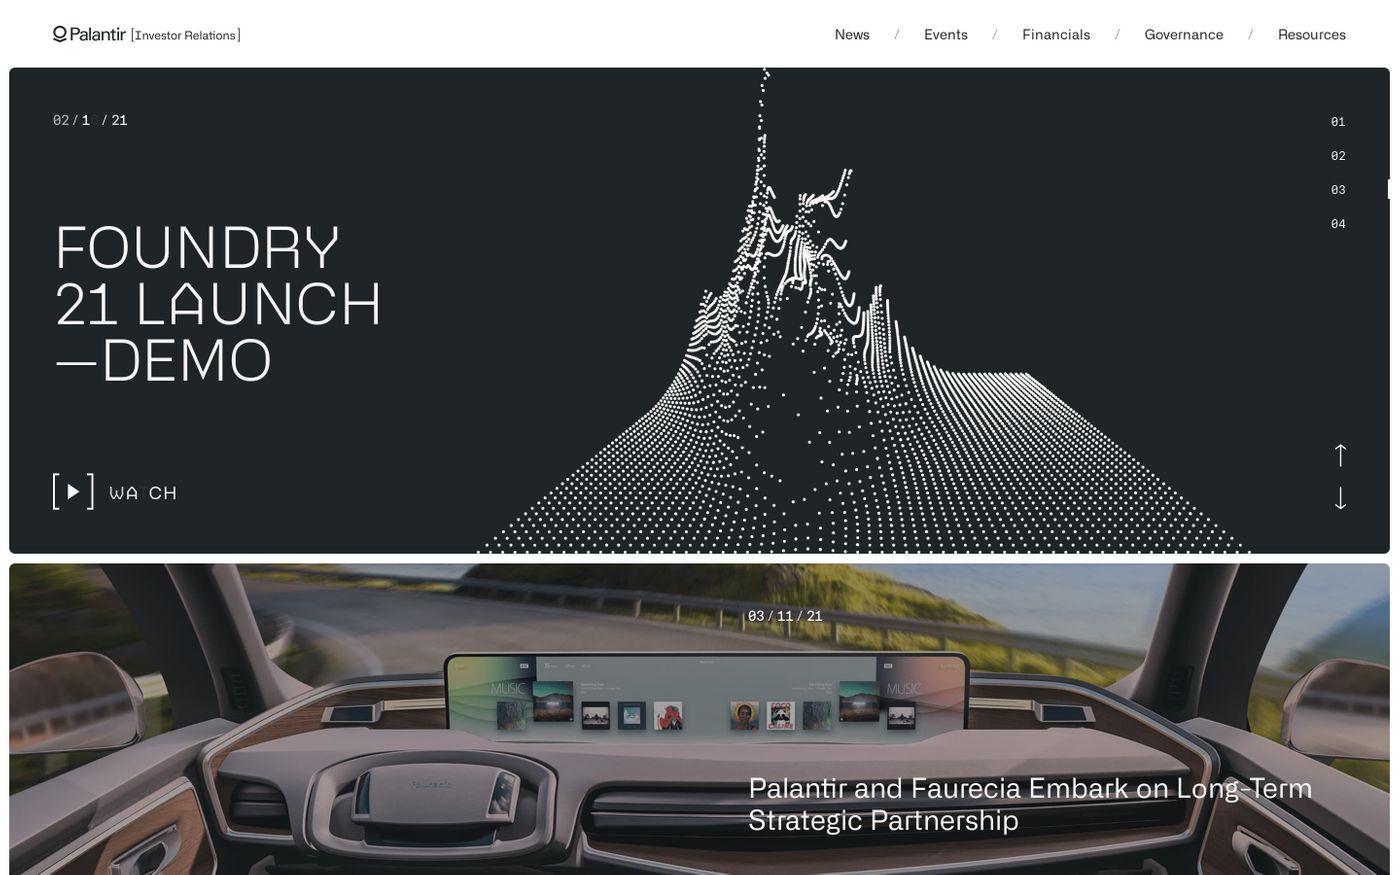 Screenshot of Palantir investor relations website